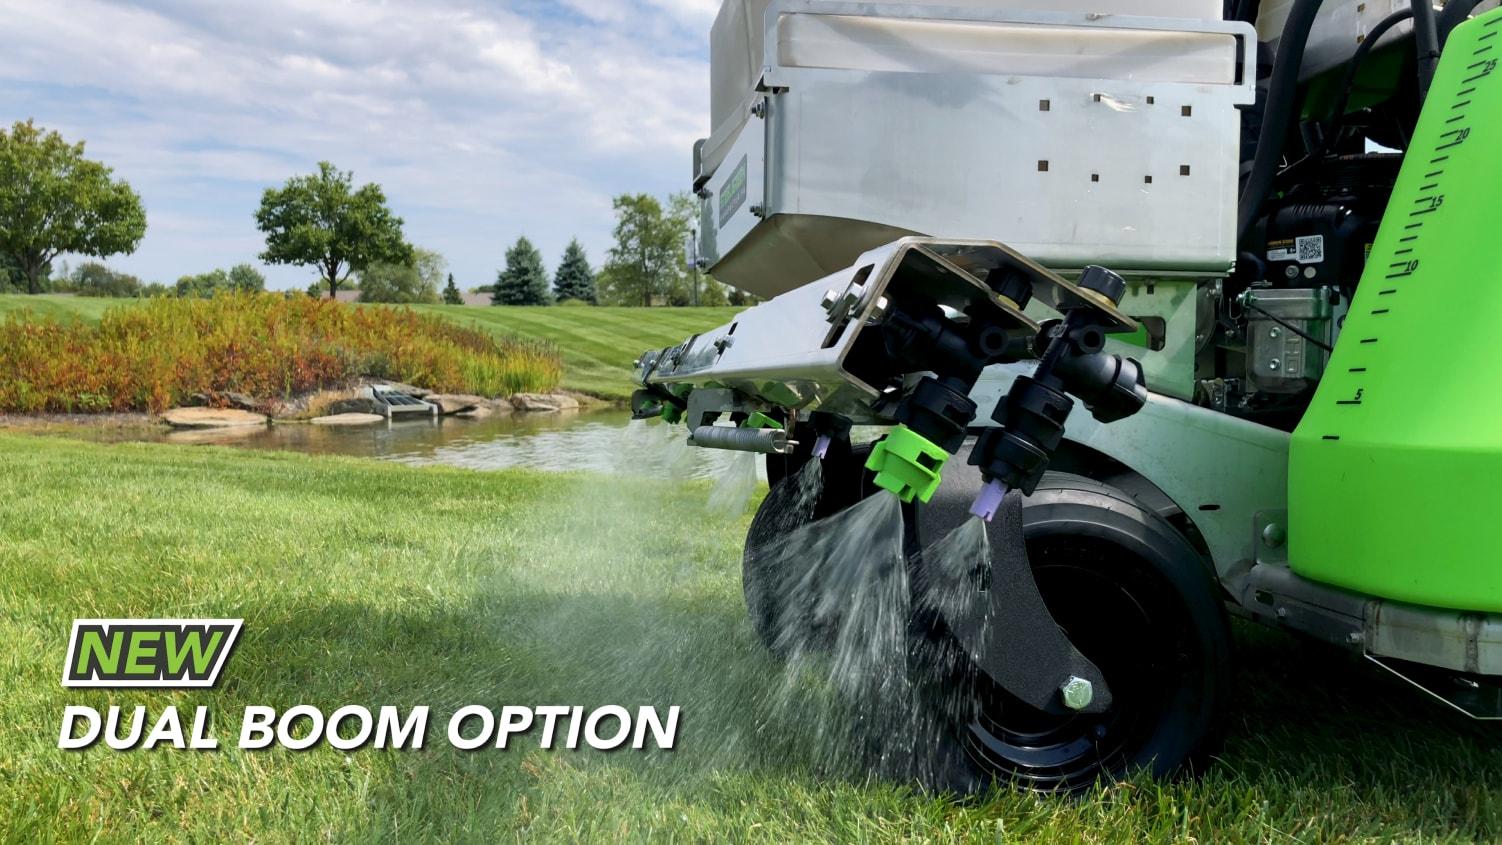 dual boom option on steel green equipment